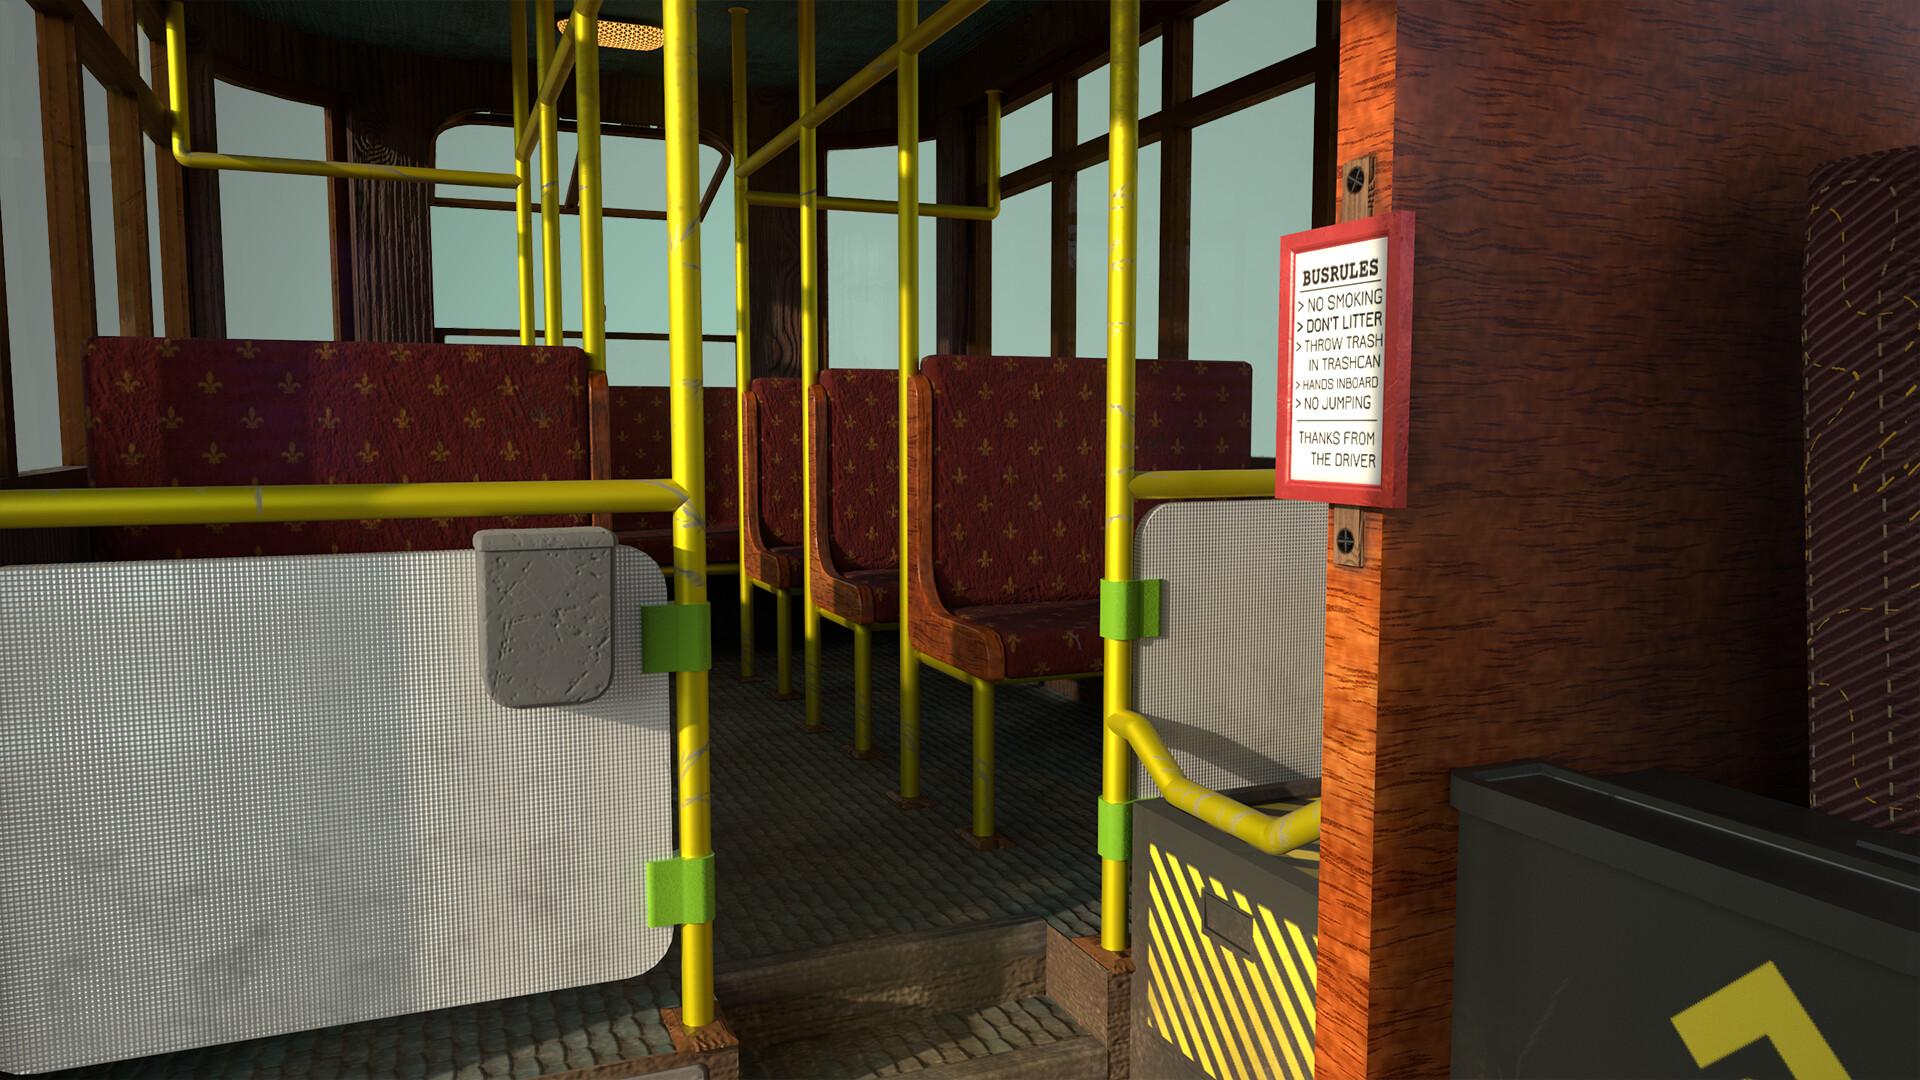 Alexander laheij tram inside look back 1920 1080